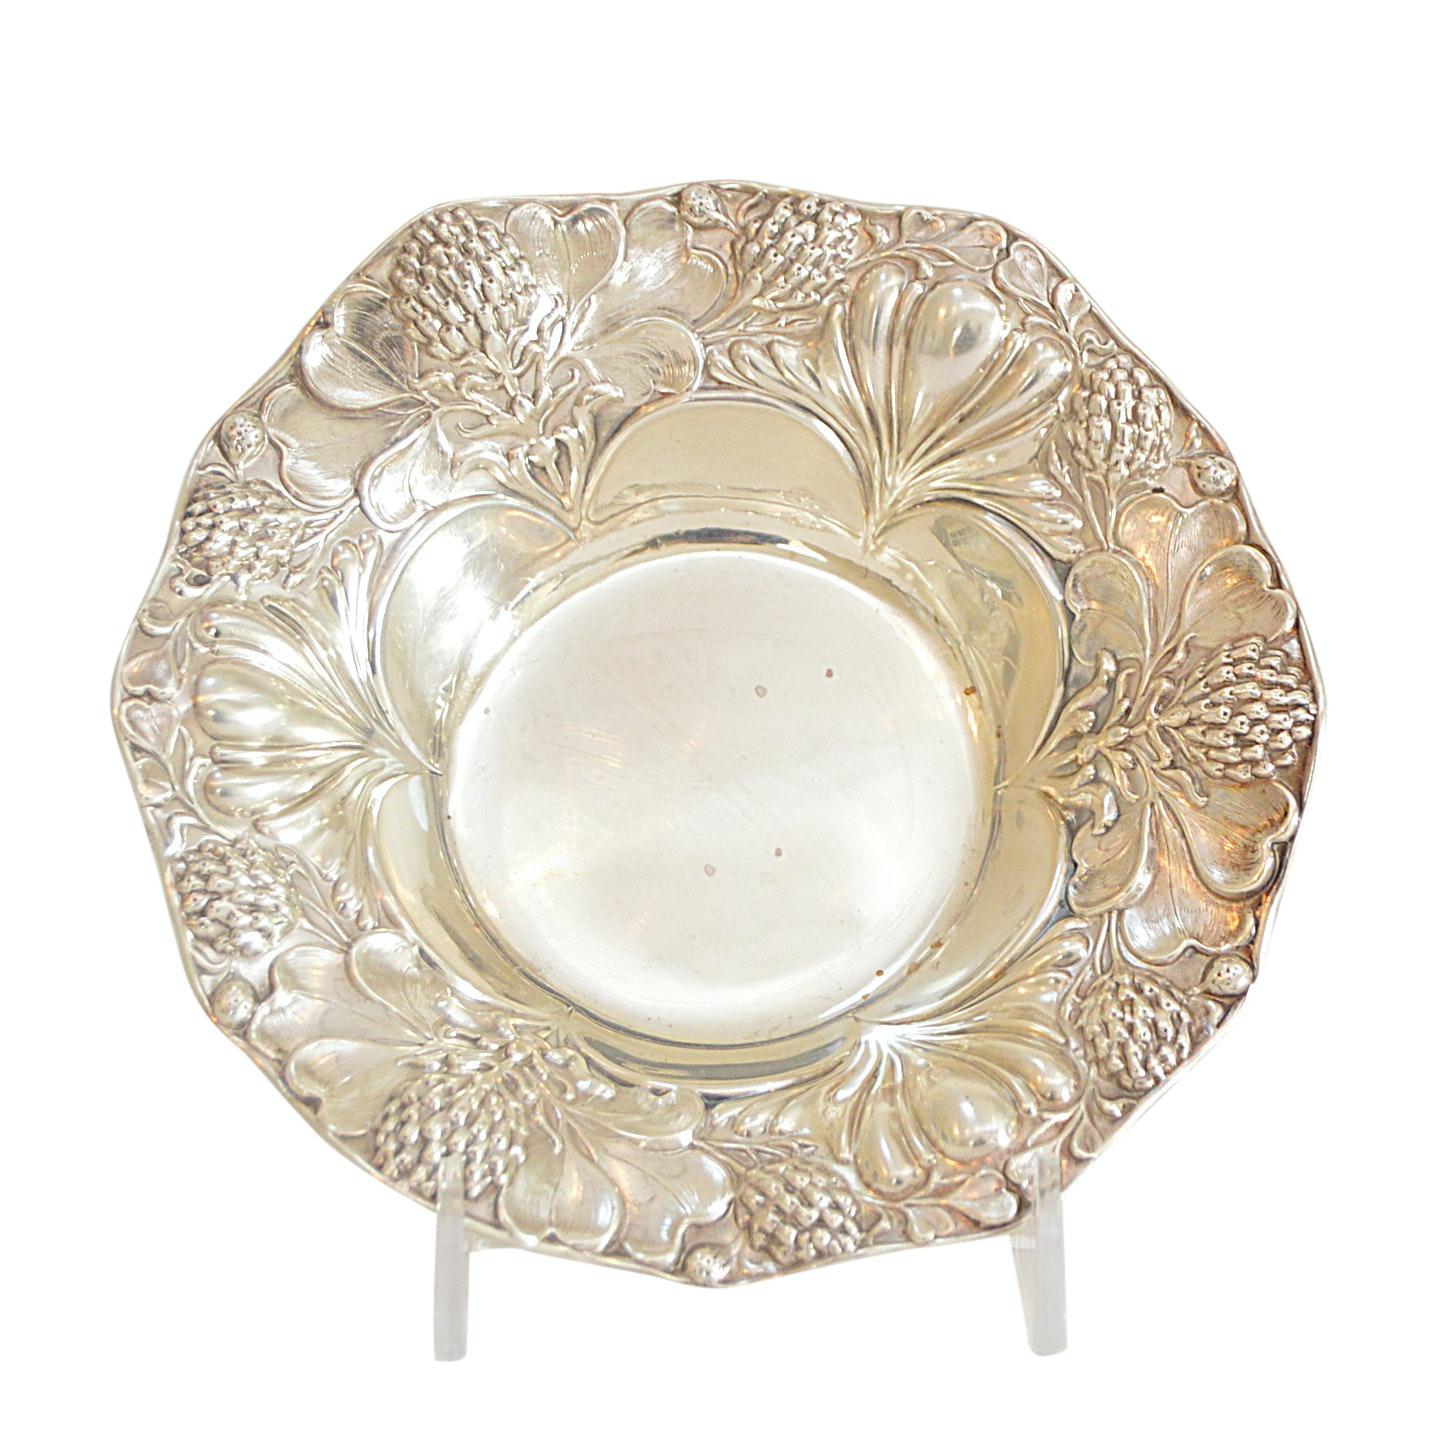 Gorham Sterling Silver Repousse Clover and Thistle Bon Bon Dish